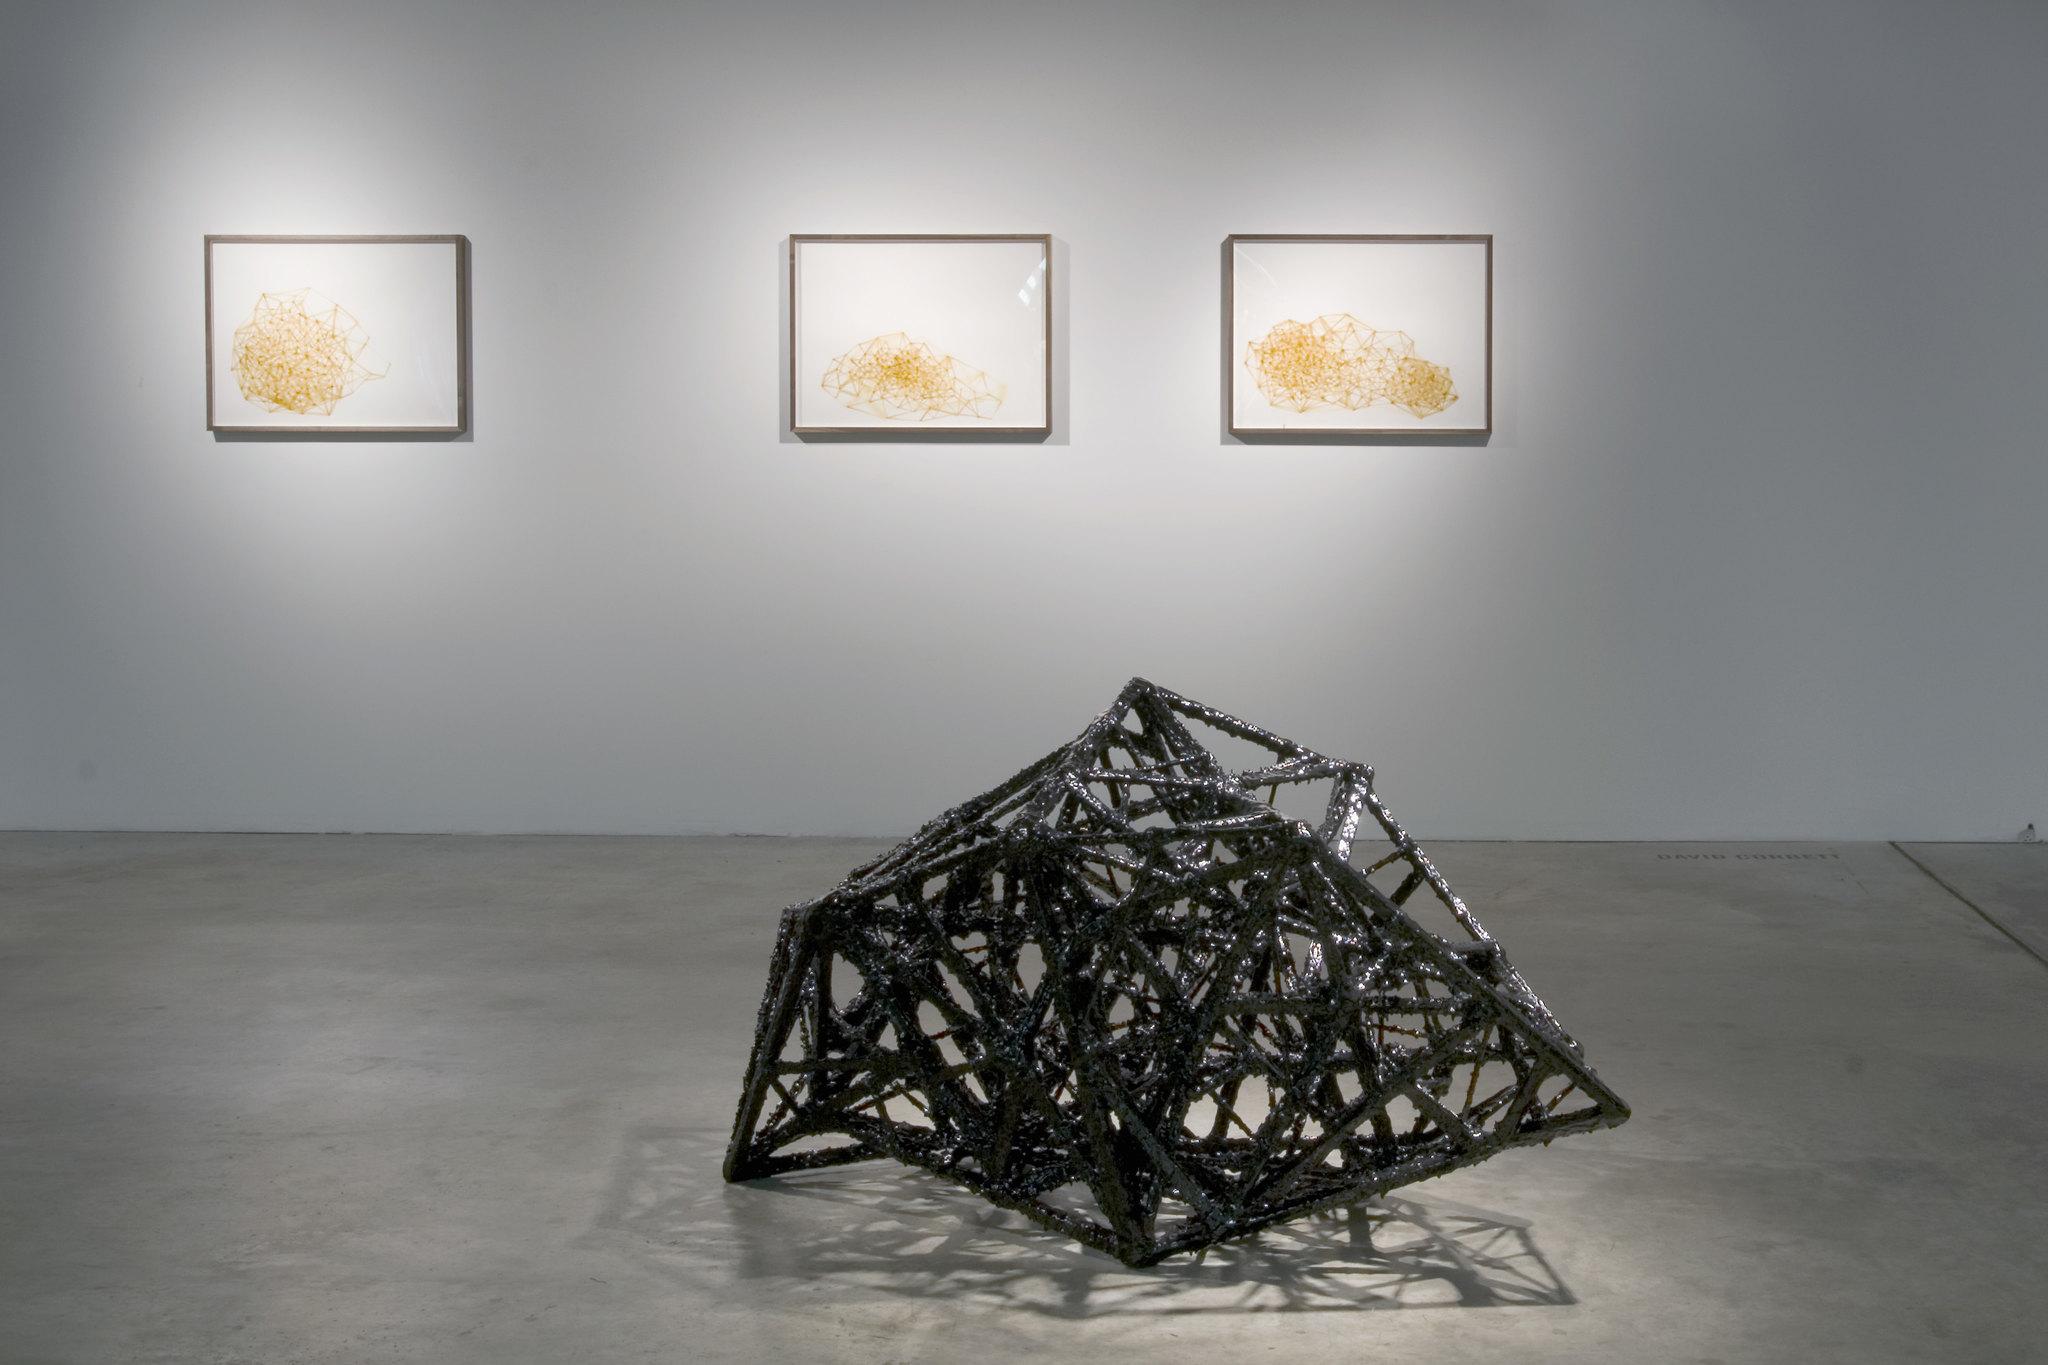 David Corbett Installation   Recent Work exhibited at Disjecta